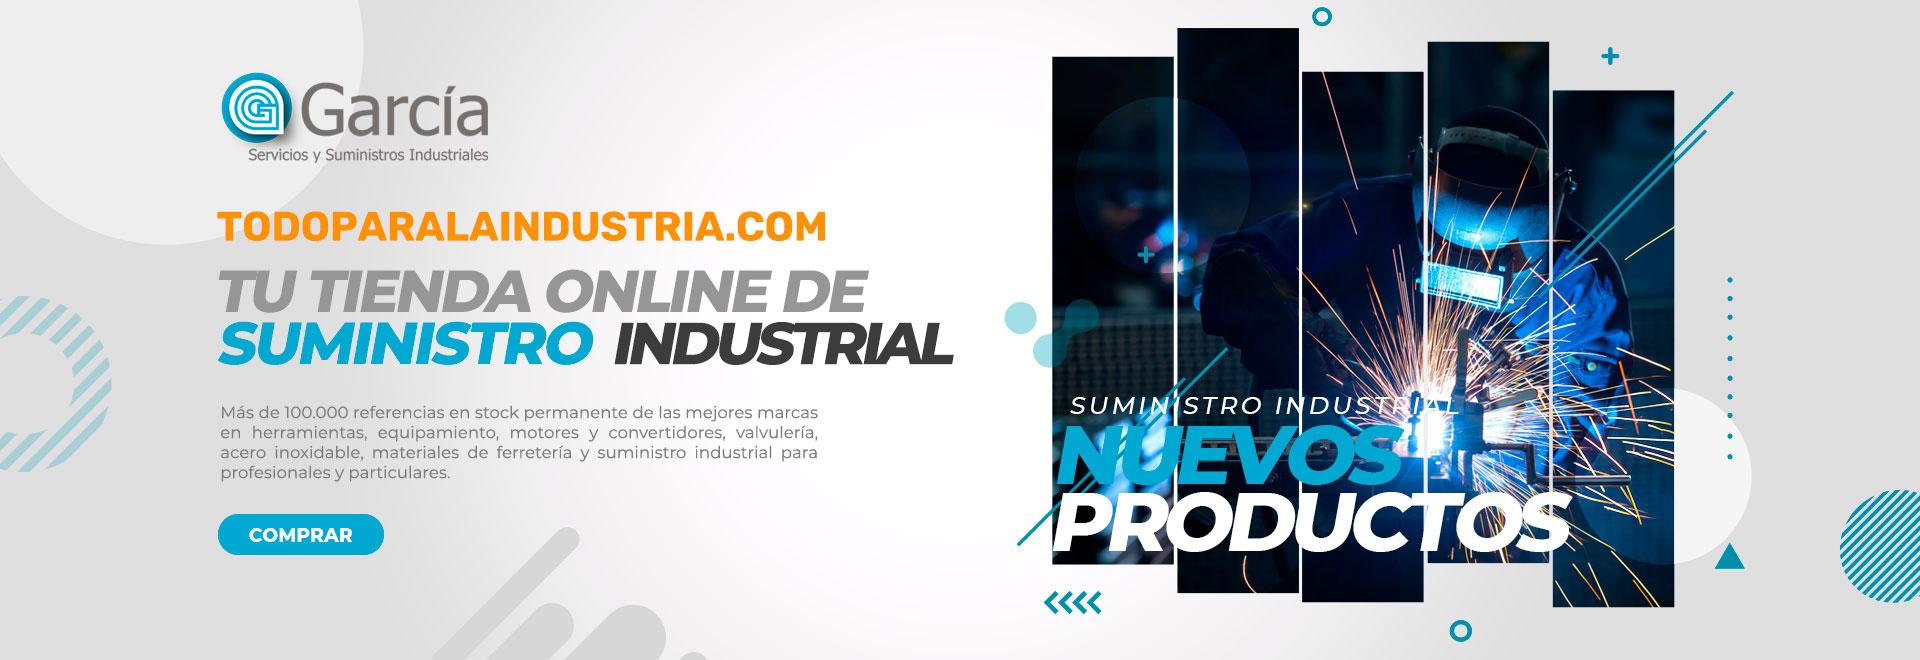 Slide-01-tienda-online-suministro-industrial